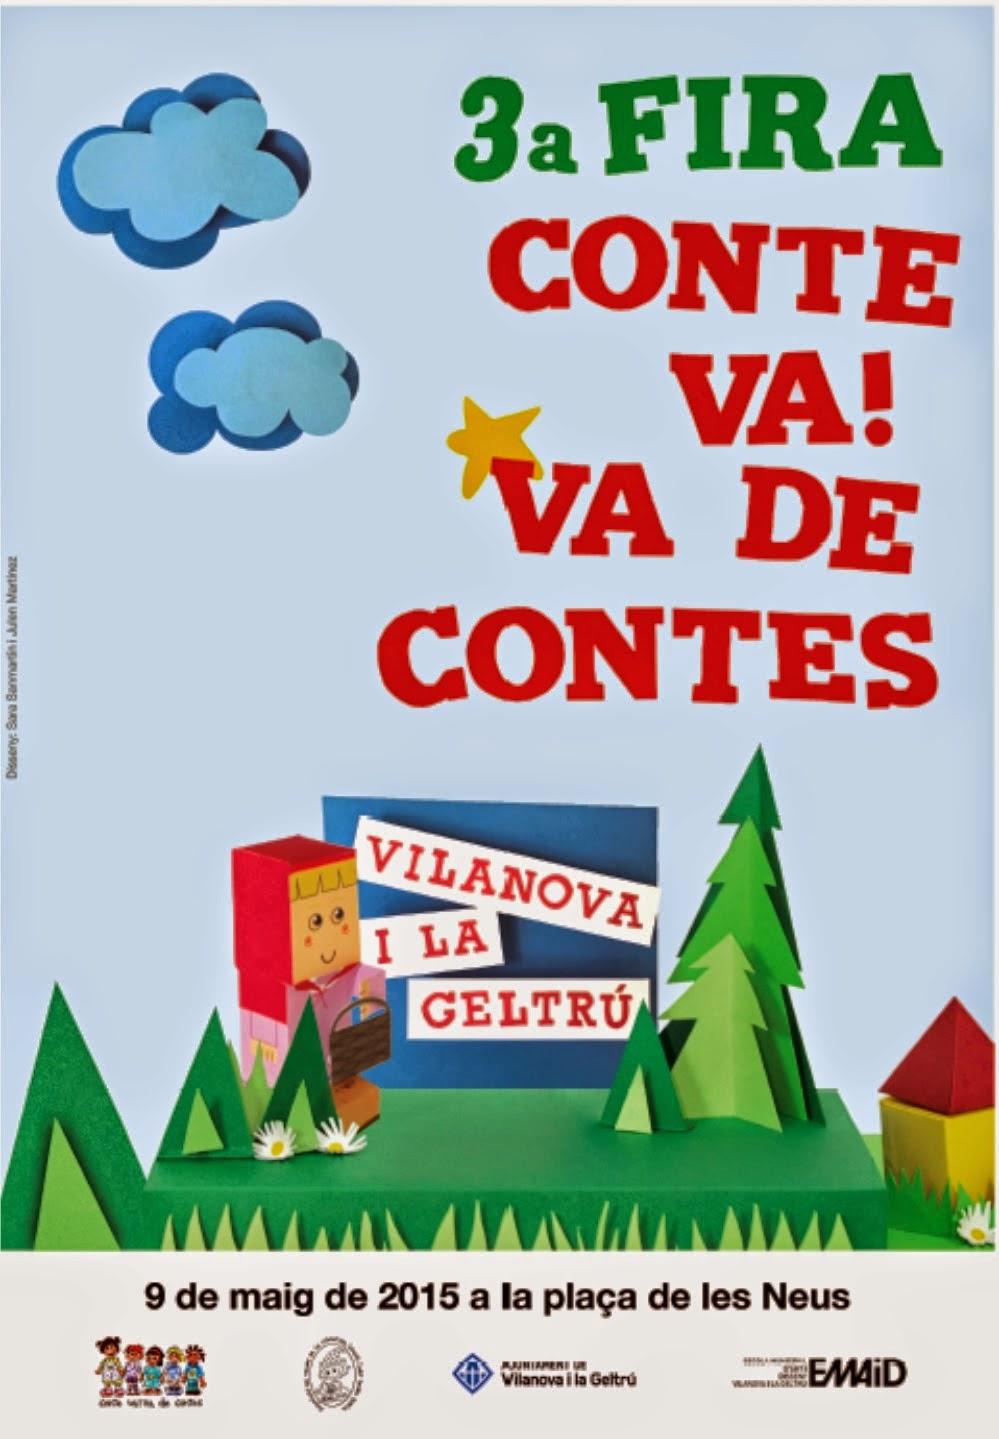 http://contevavadecontes.blogspot.com.es/2015/04/conte-va-va-de-contes-el-programa-de-la.html